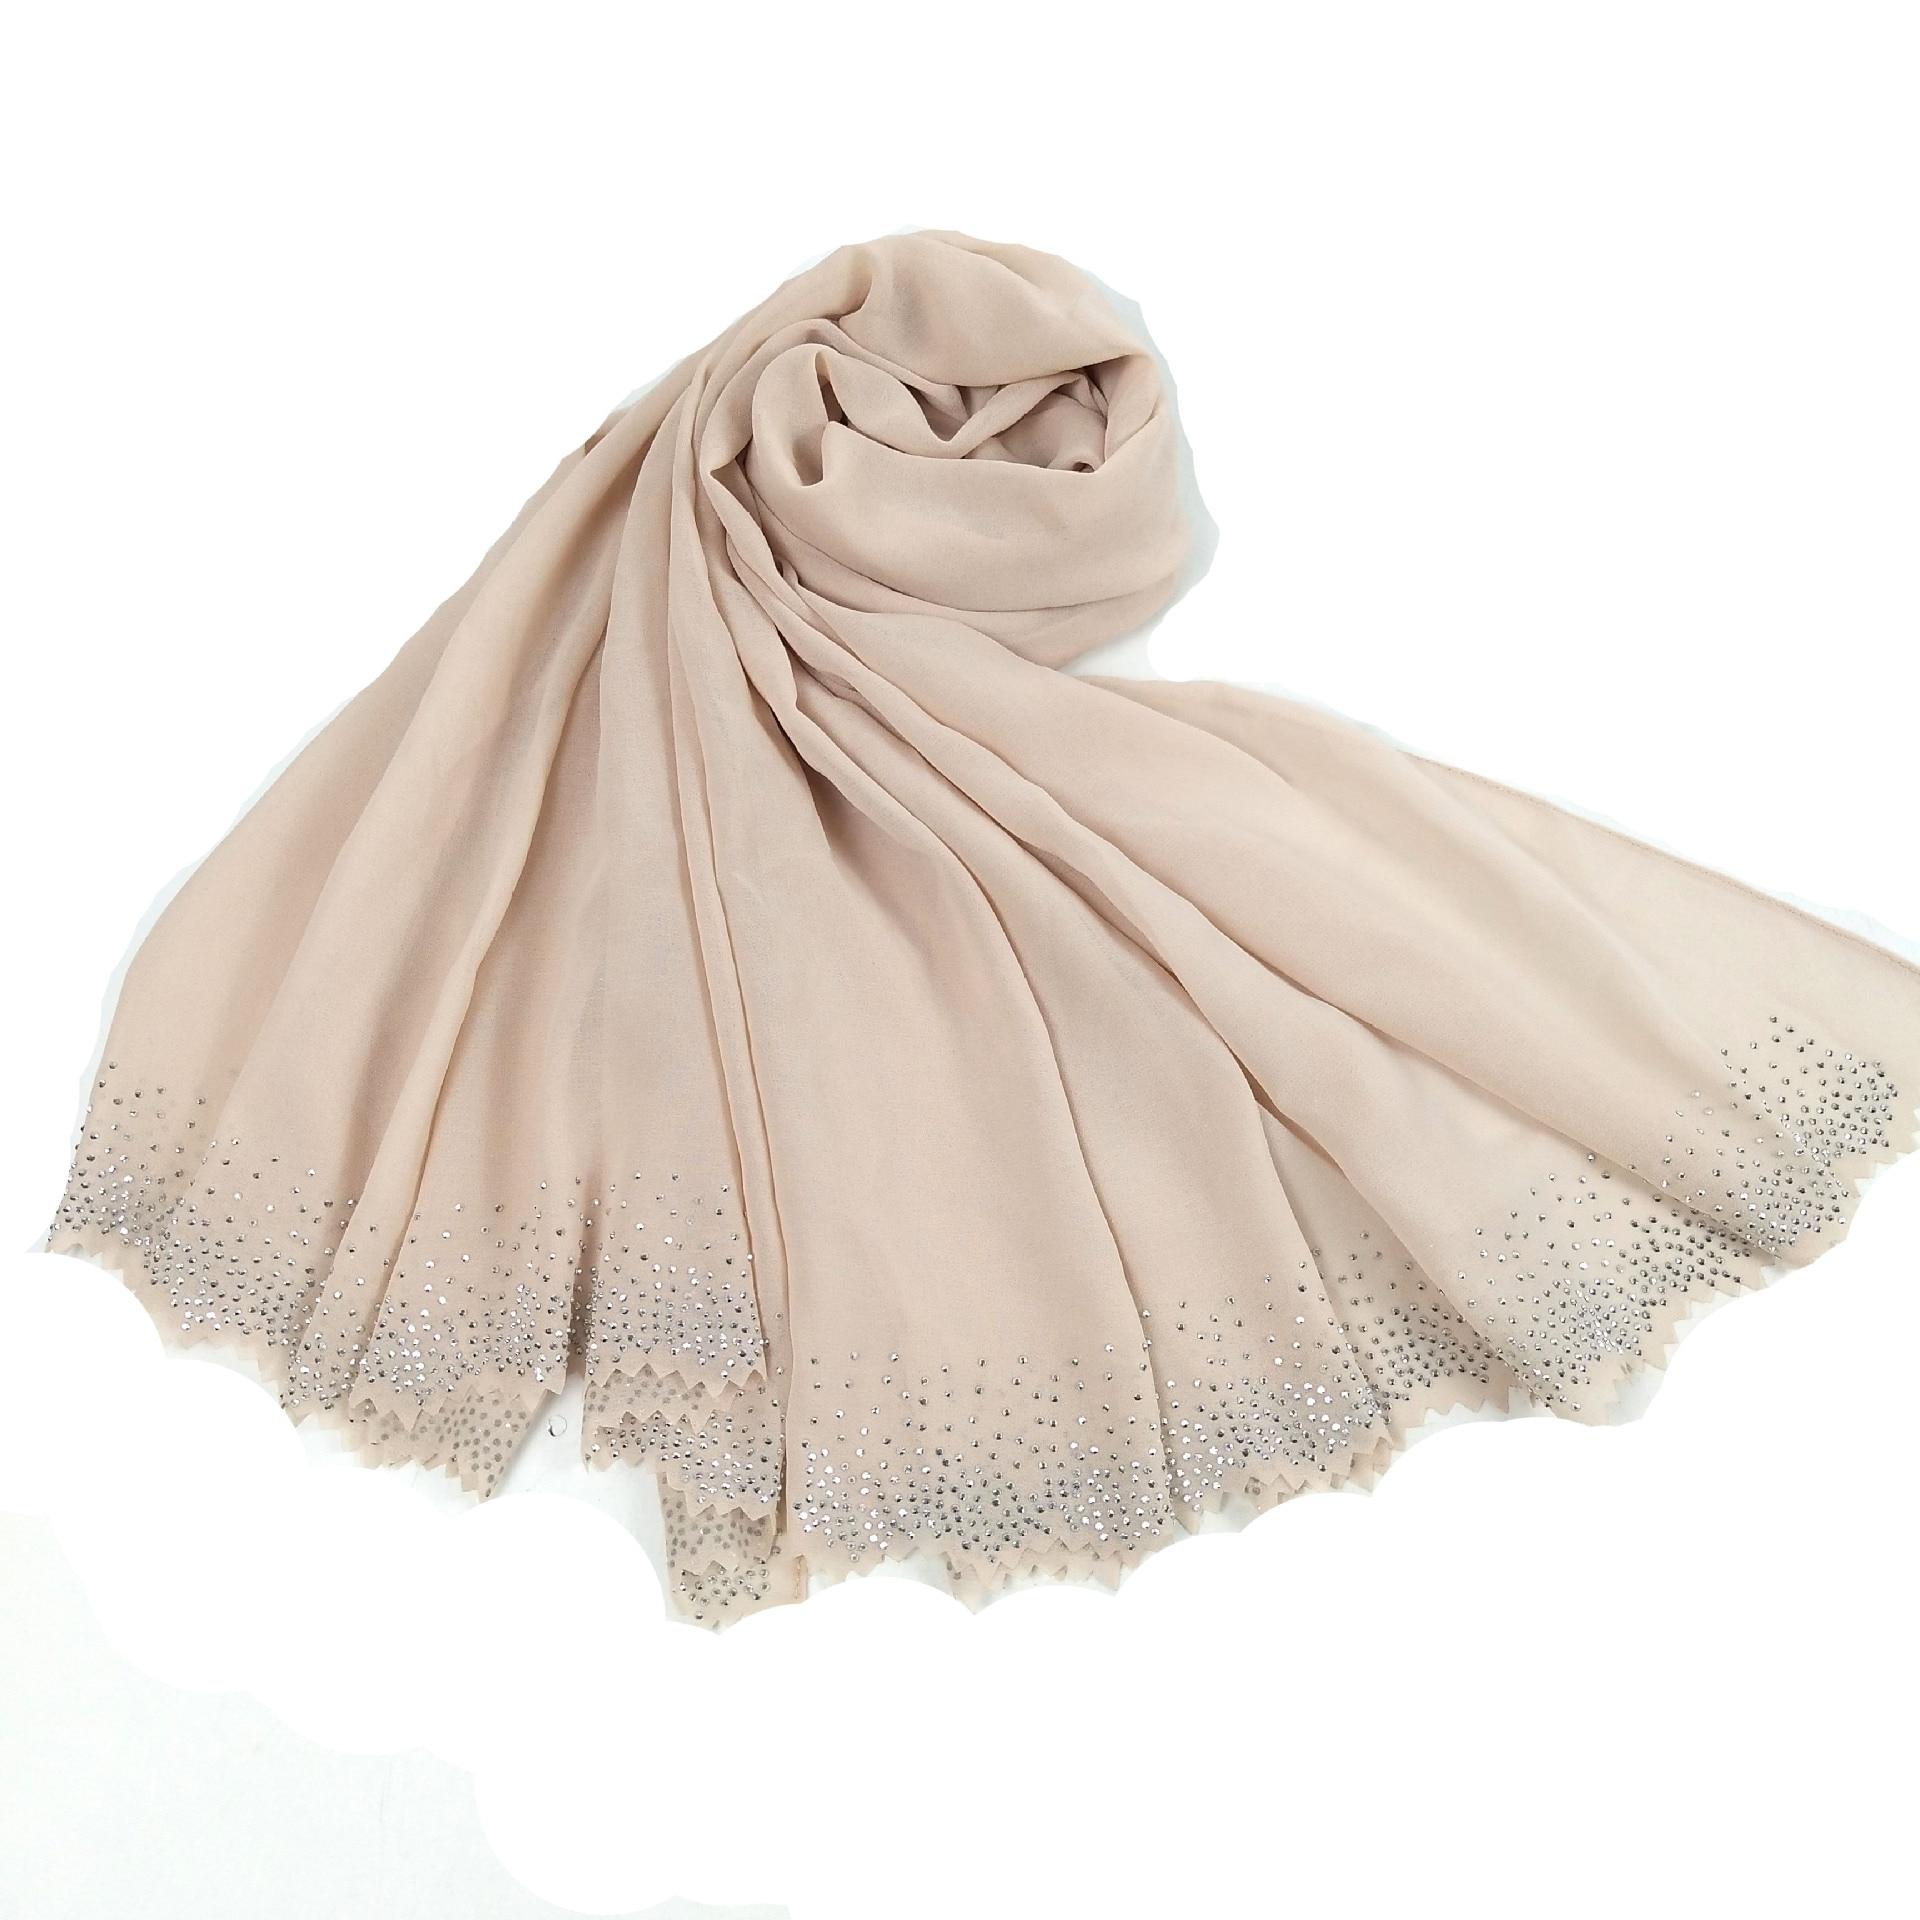 Image 4 - New Hollow Hot Diamond Pearl Chiffon Headscarf Muslim Hijab Long Towel Malaysian ShawlIslamic Clothing